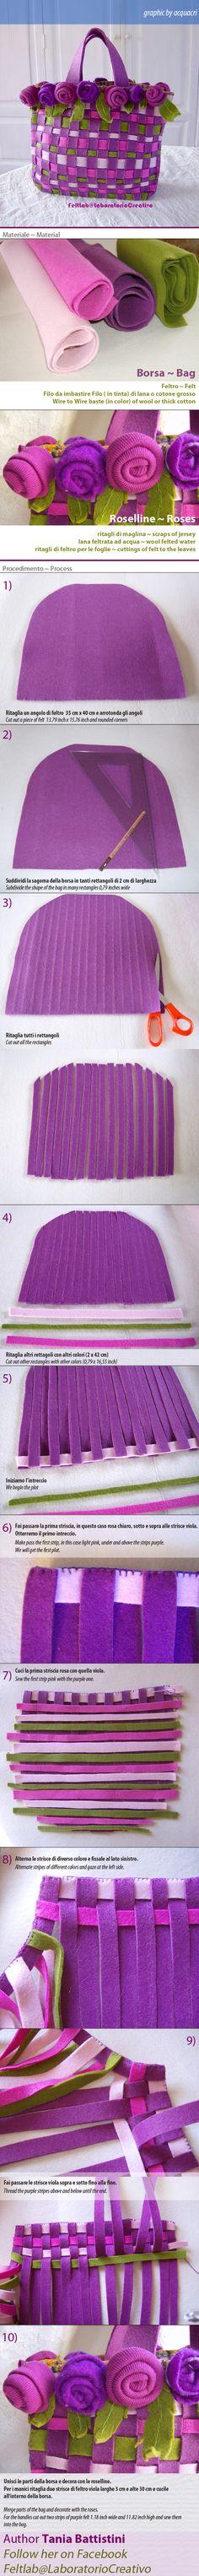 Borsa di feltro intrecciata | Felt bag woven | #felt #howtomake #DIY #bag #tutorial #faidate #creatività #artigianato